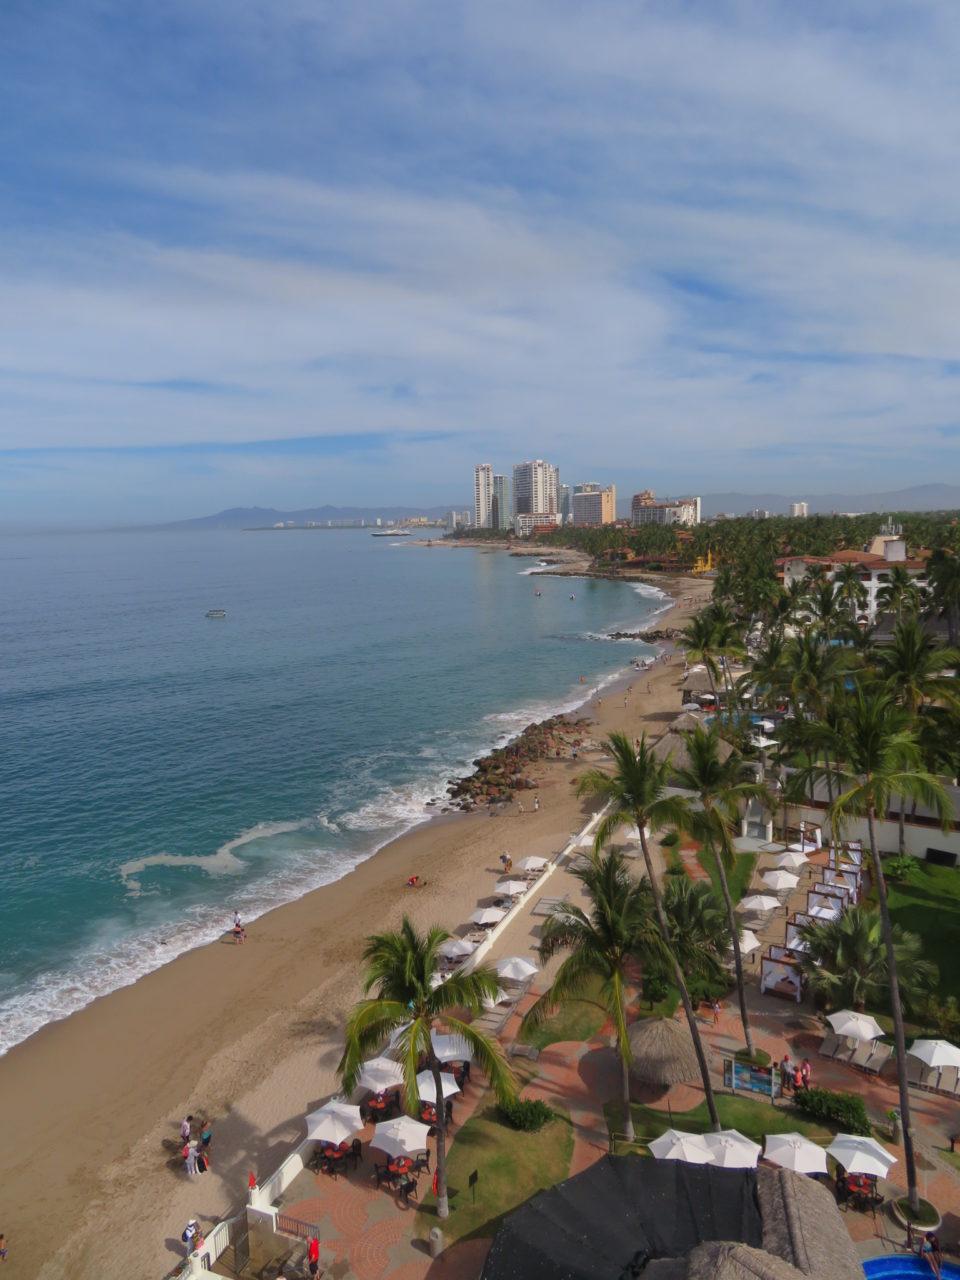 Some of the many inviting beaches of Puerto Vallarta